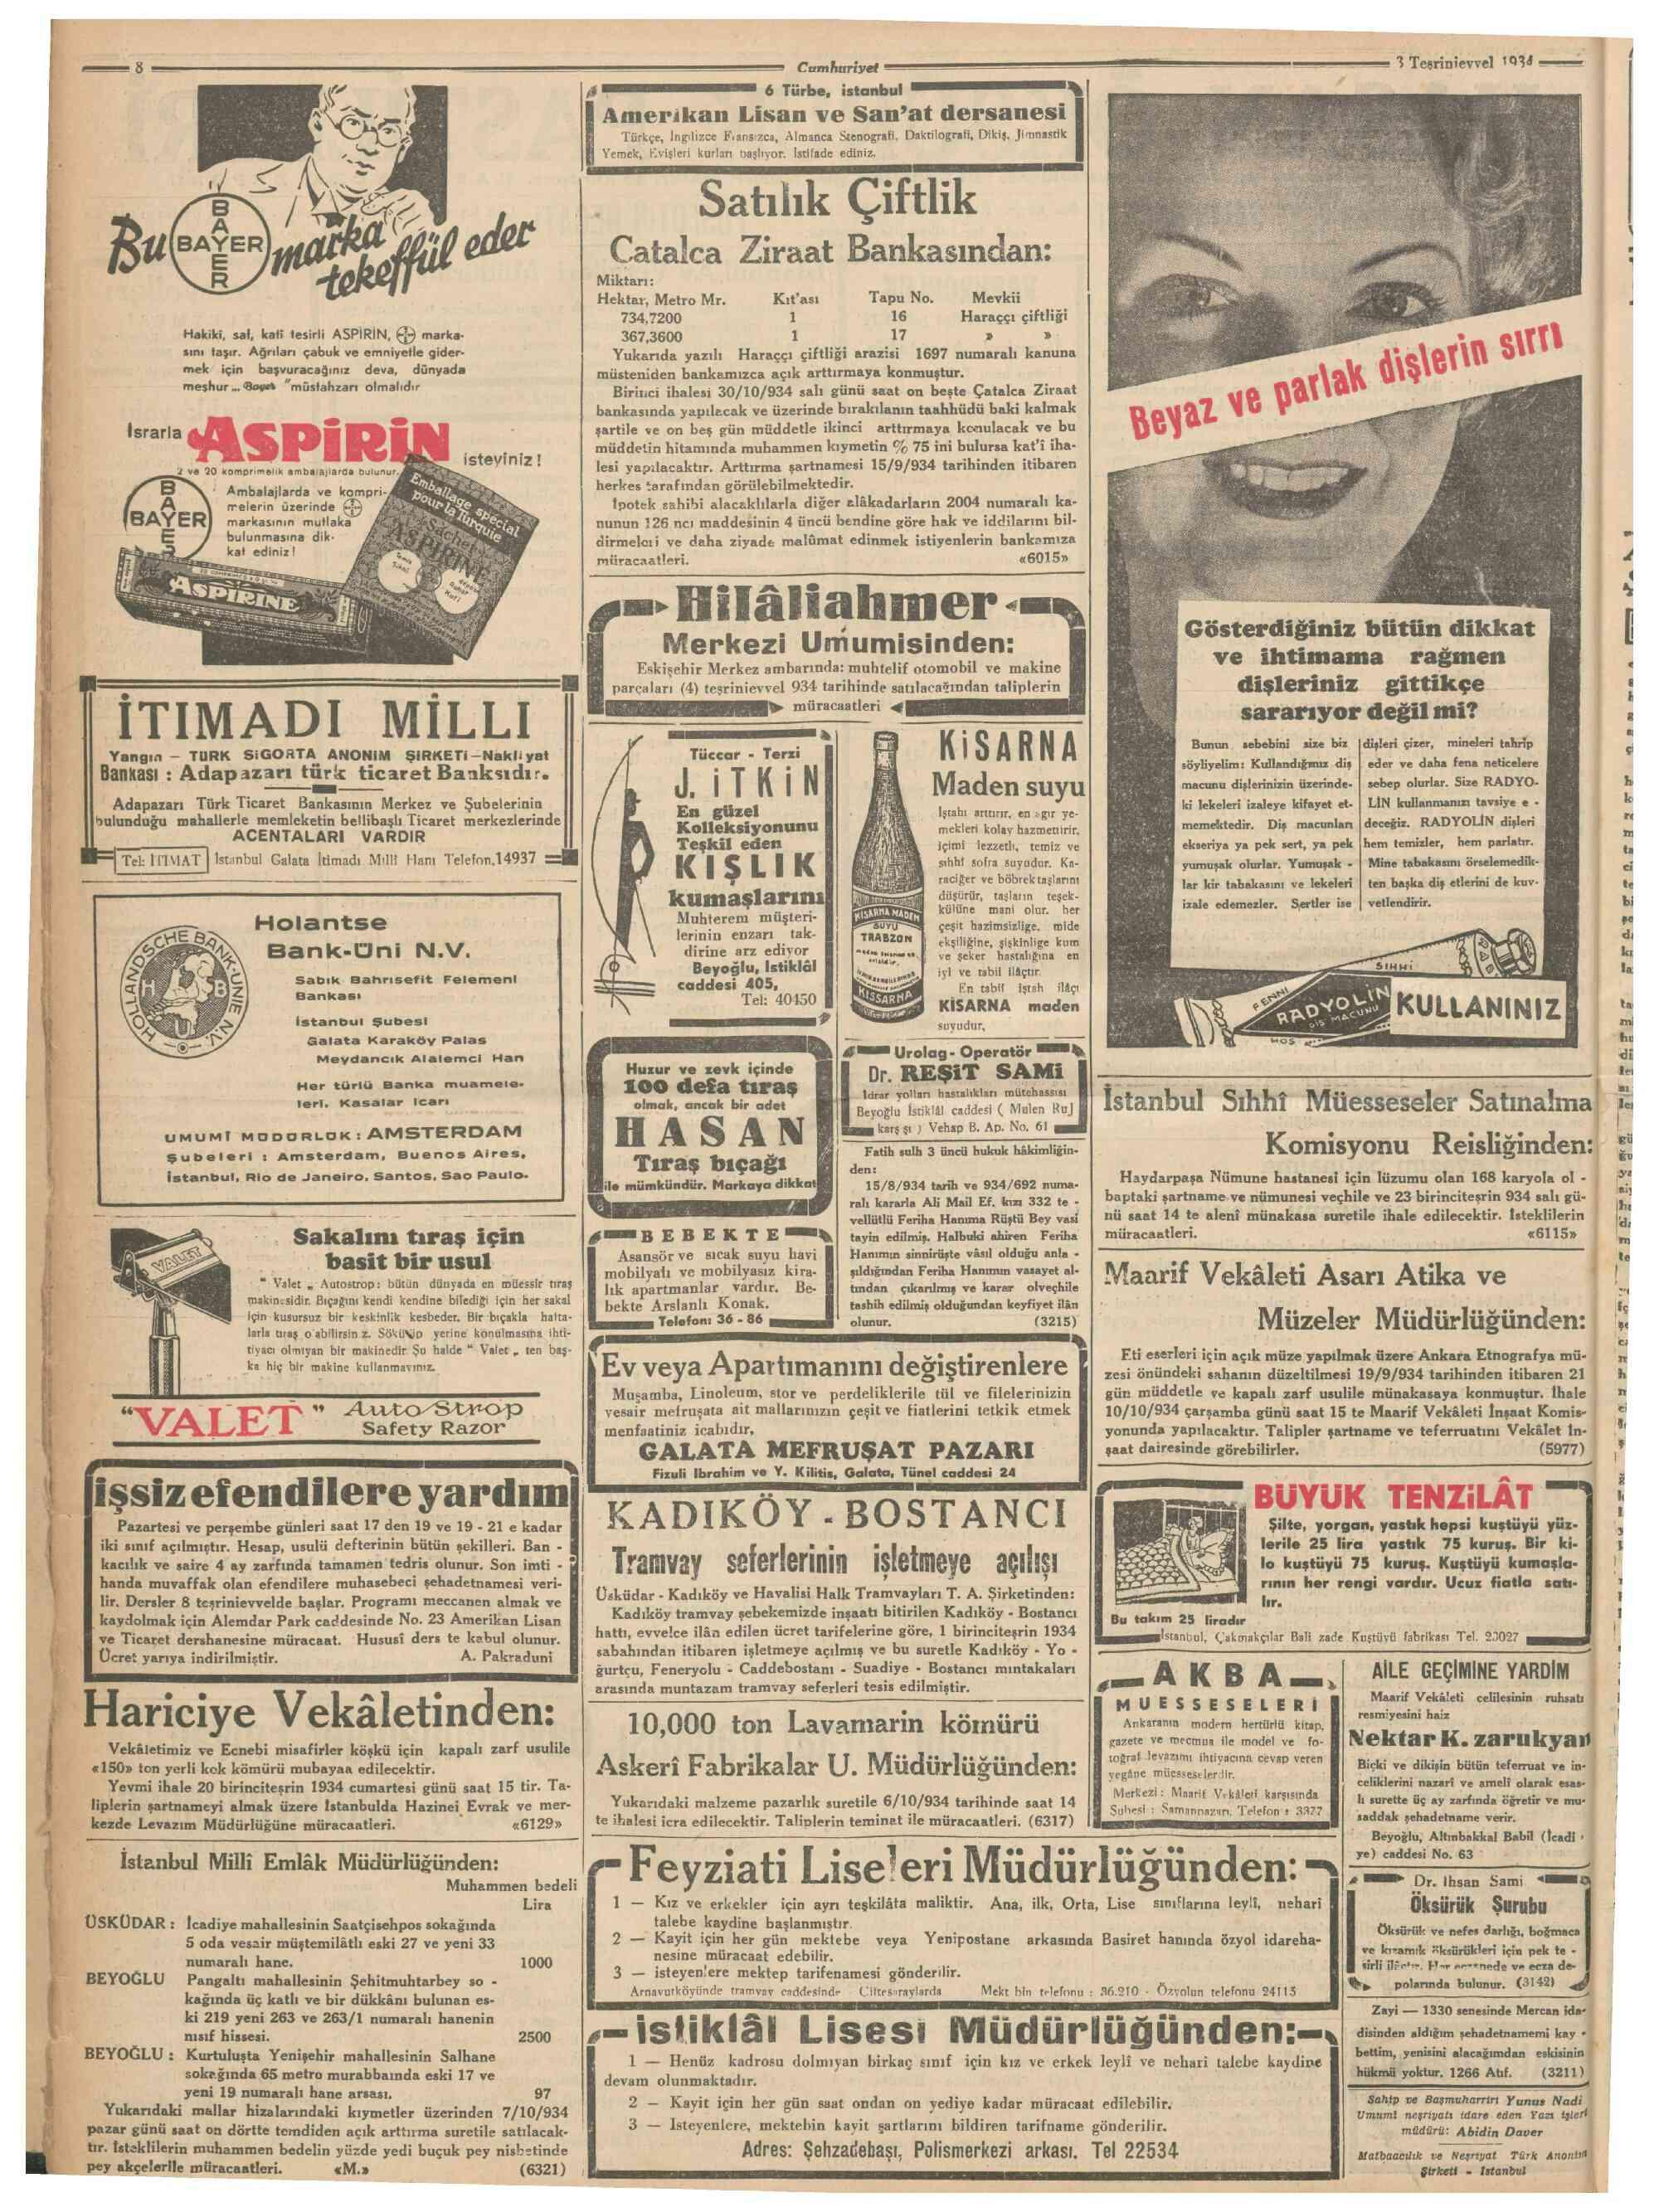 4 Ekim 1934 Tarihli Cumhuriyet Dergisi Sayfa 1